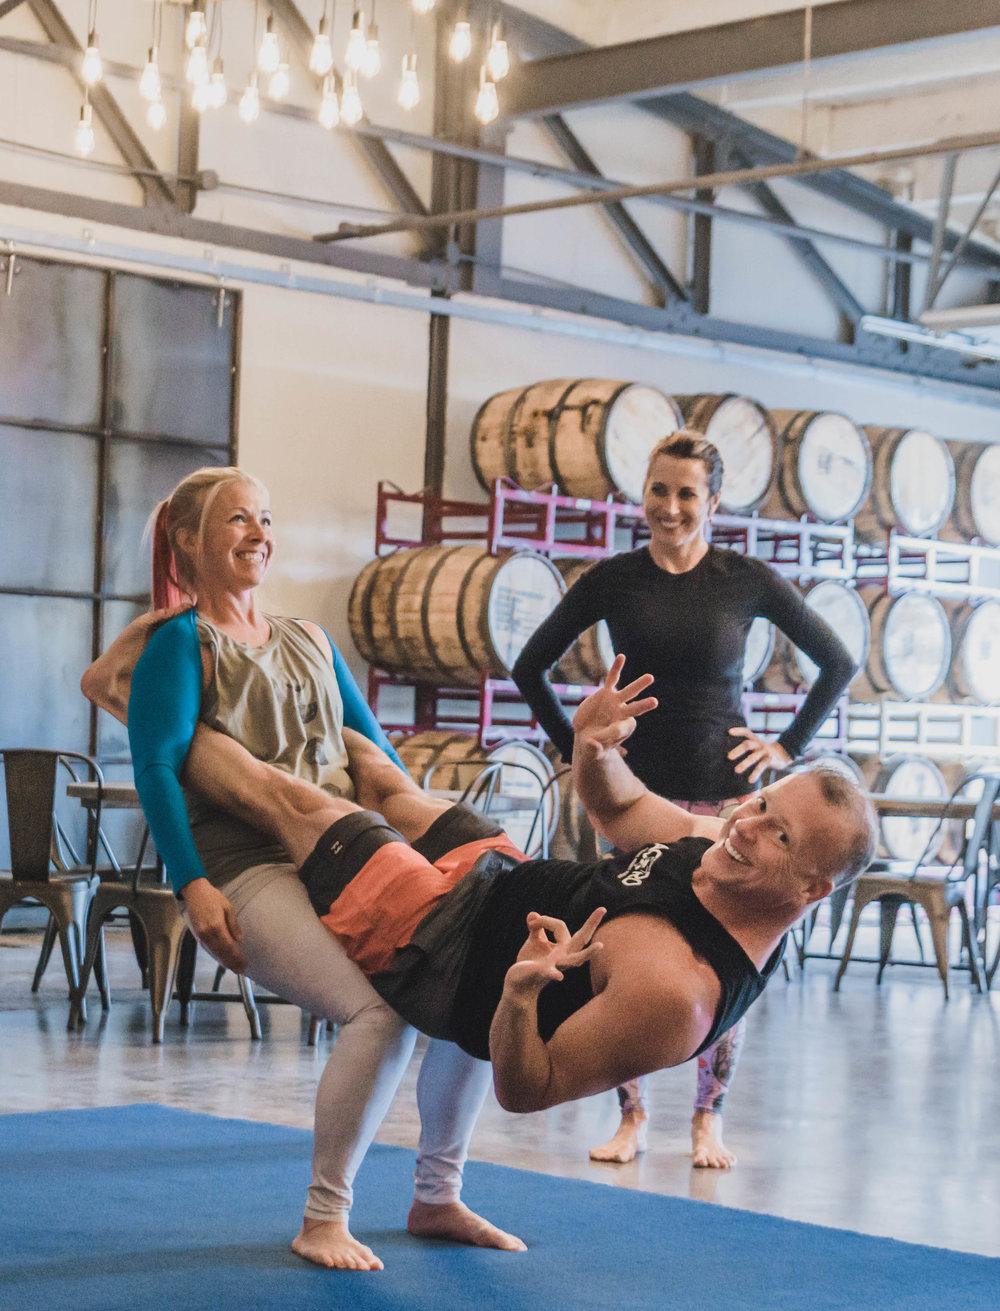 The Class: Acro Yoga Instructors:  Ron Hopkins  and  Kimberly Hart  | Location:  Hotel Tango's The Foxhole  | Photo Cred:  Amy Hall